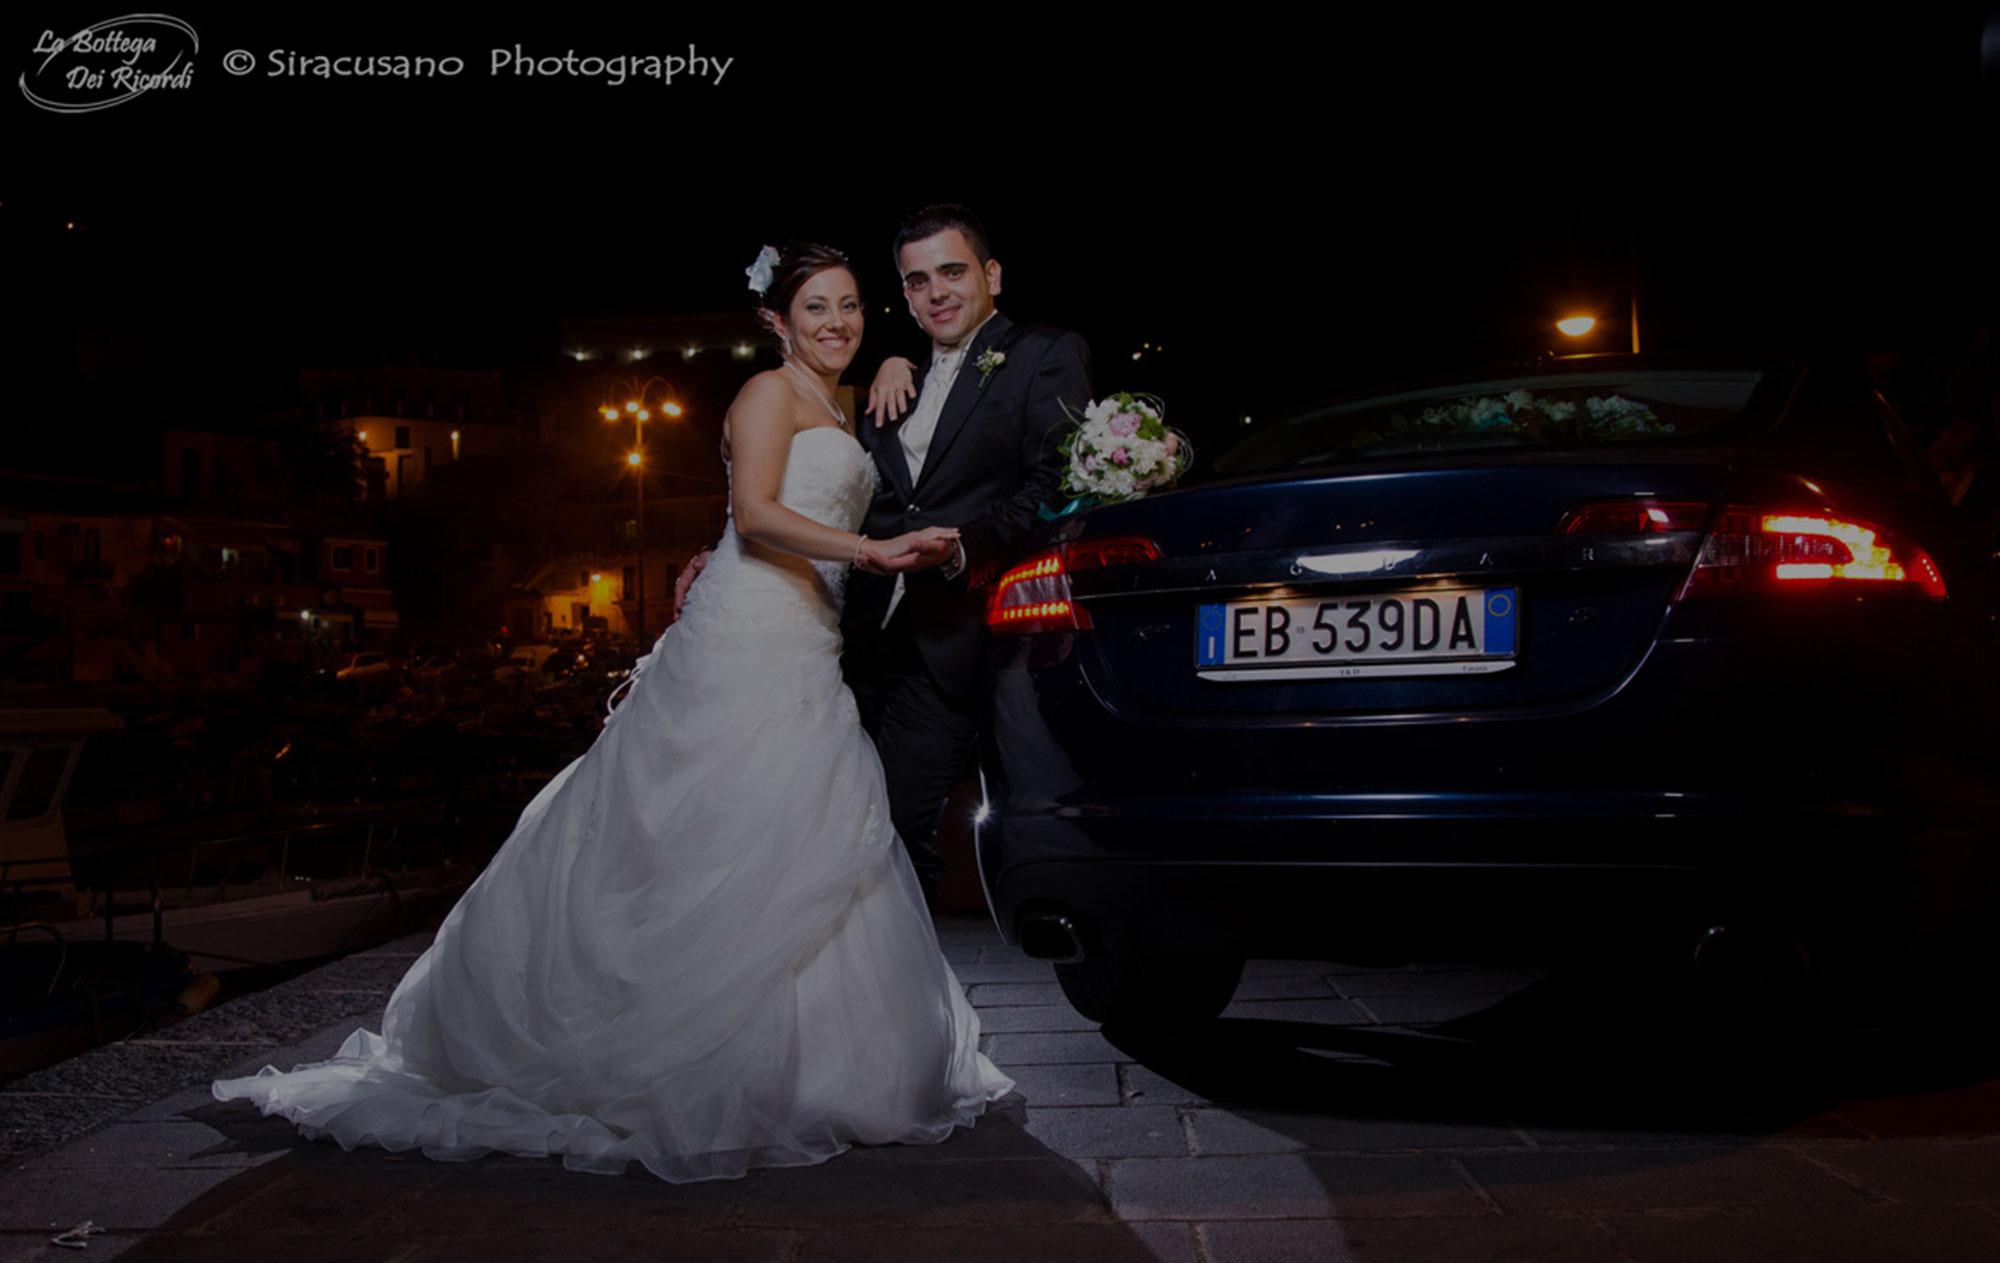 Fotografo Matrimonio La Bottega dei Ricordi Messina - Matrimonio Giuseppe e Mary